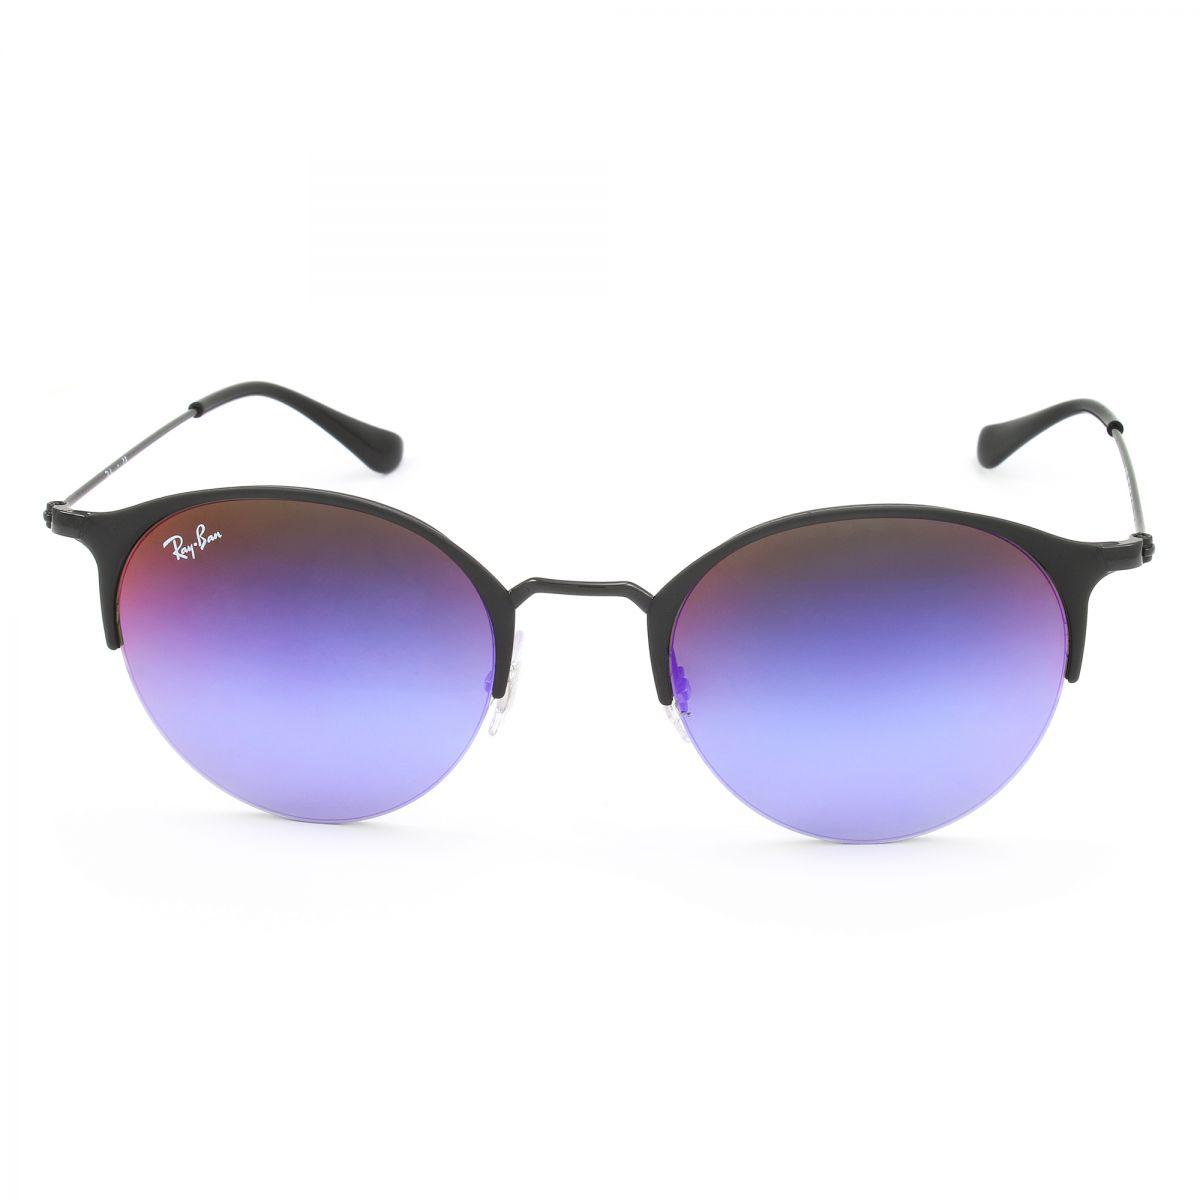 RAY BAN RAY-BAN Damen Sonnenbrille » RB3578«, schwarz, 186/B1 - schwarz/blau